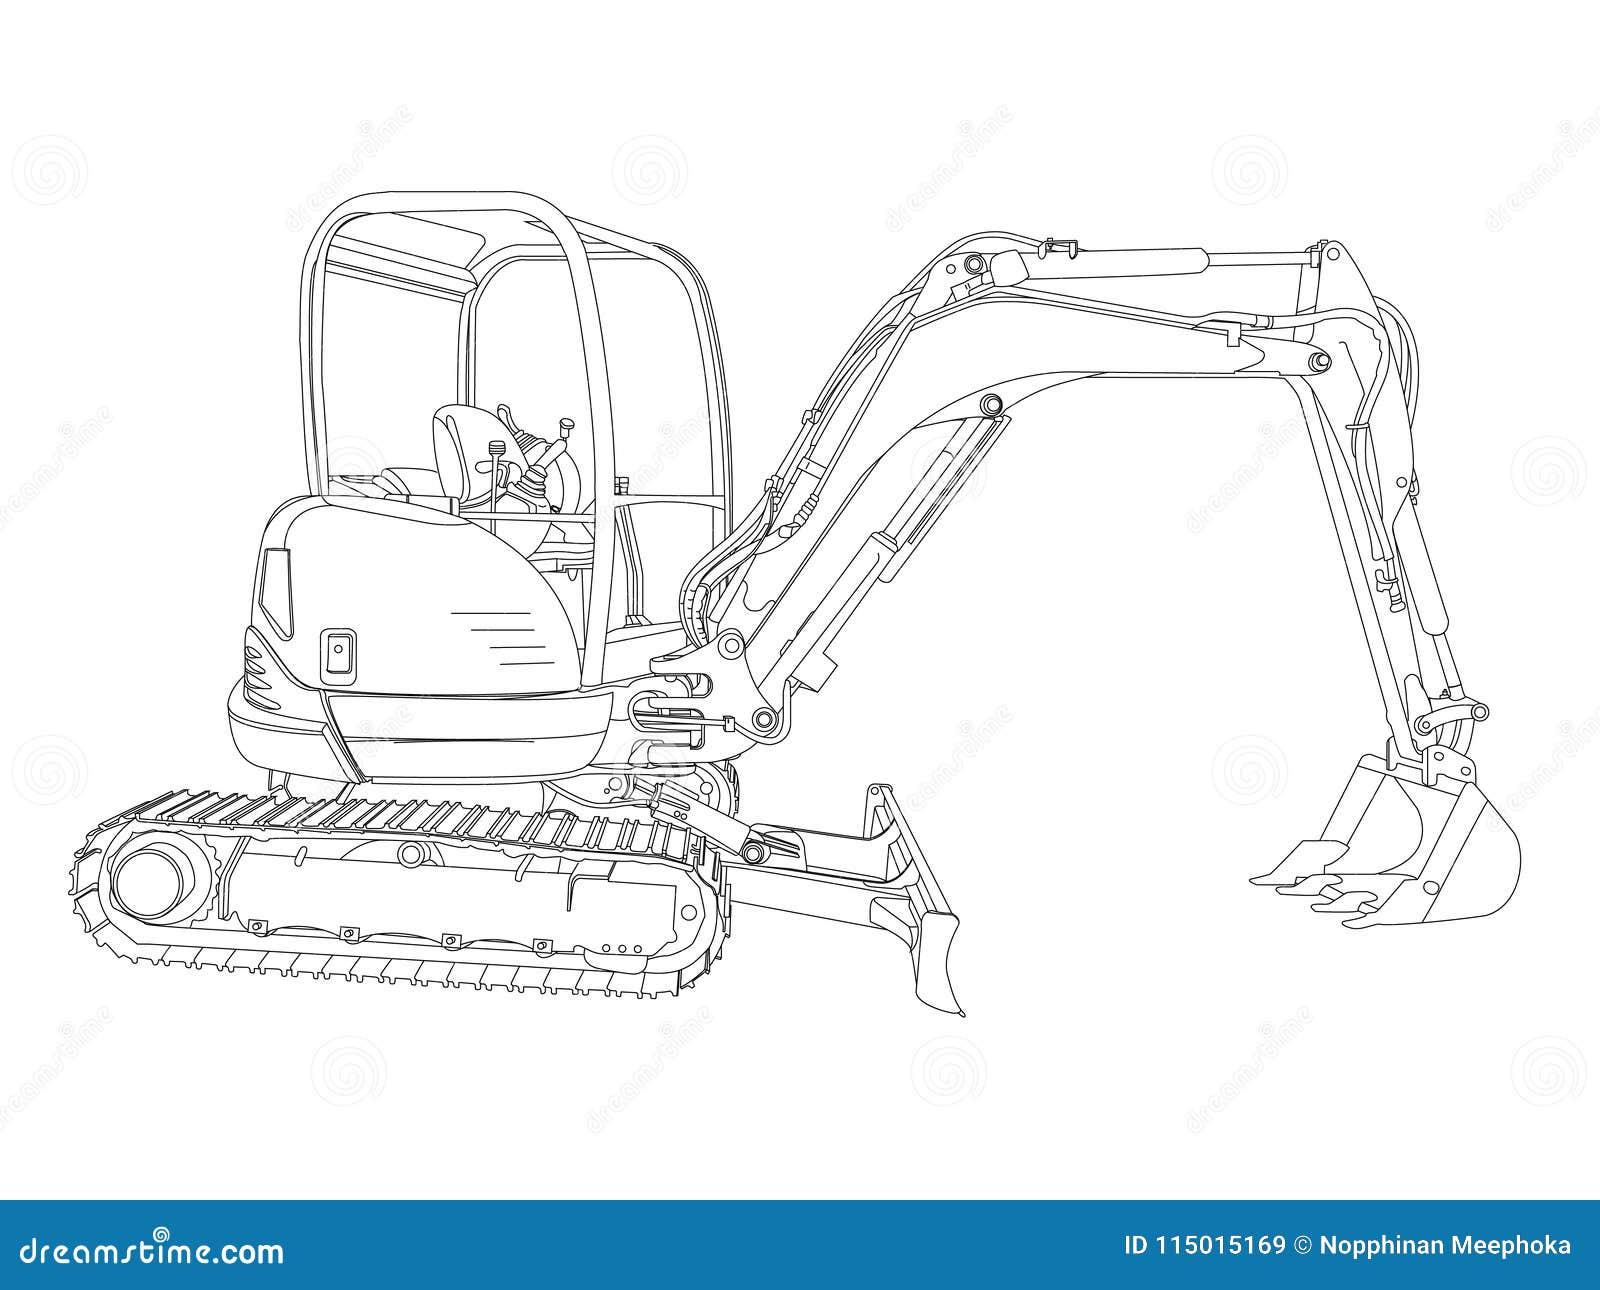 the sketch of a hydraulic cylinder cartoon vector